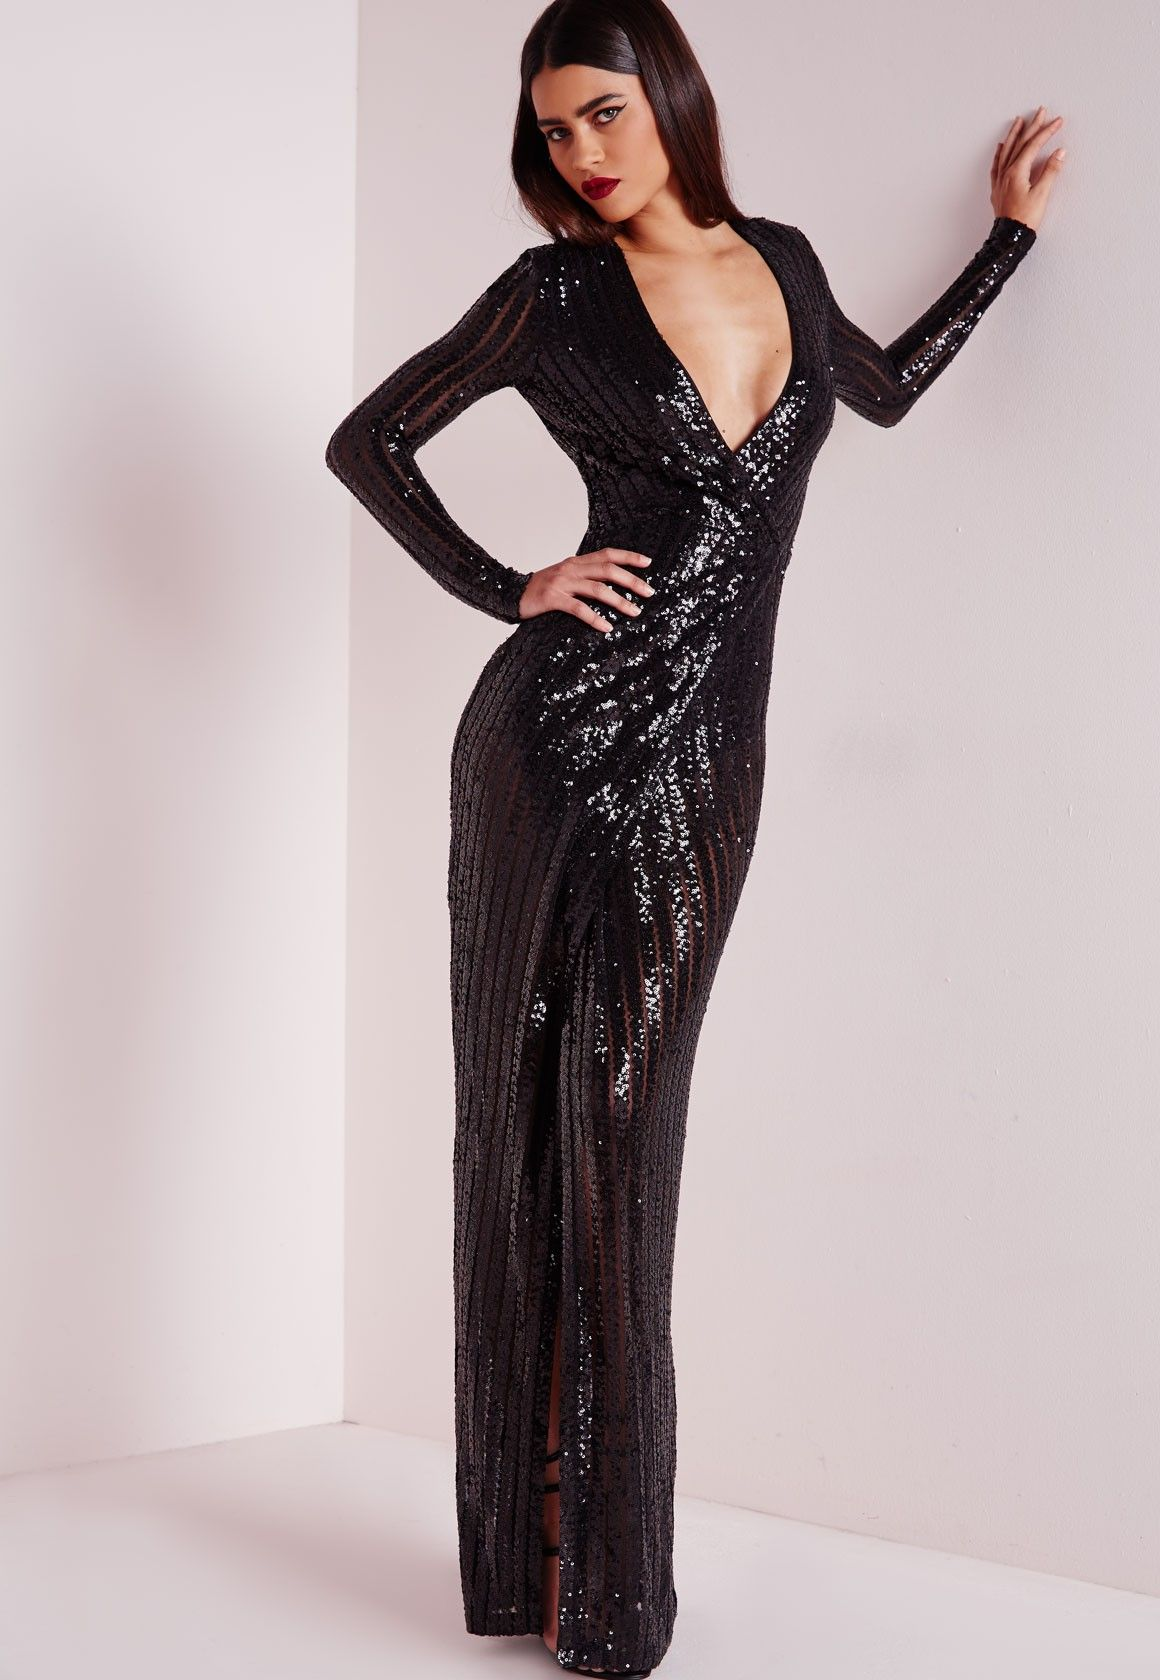 88f18e2d0584c Missguided - Premium Sequin Stripe Wrap Maxi Dress Black